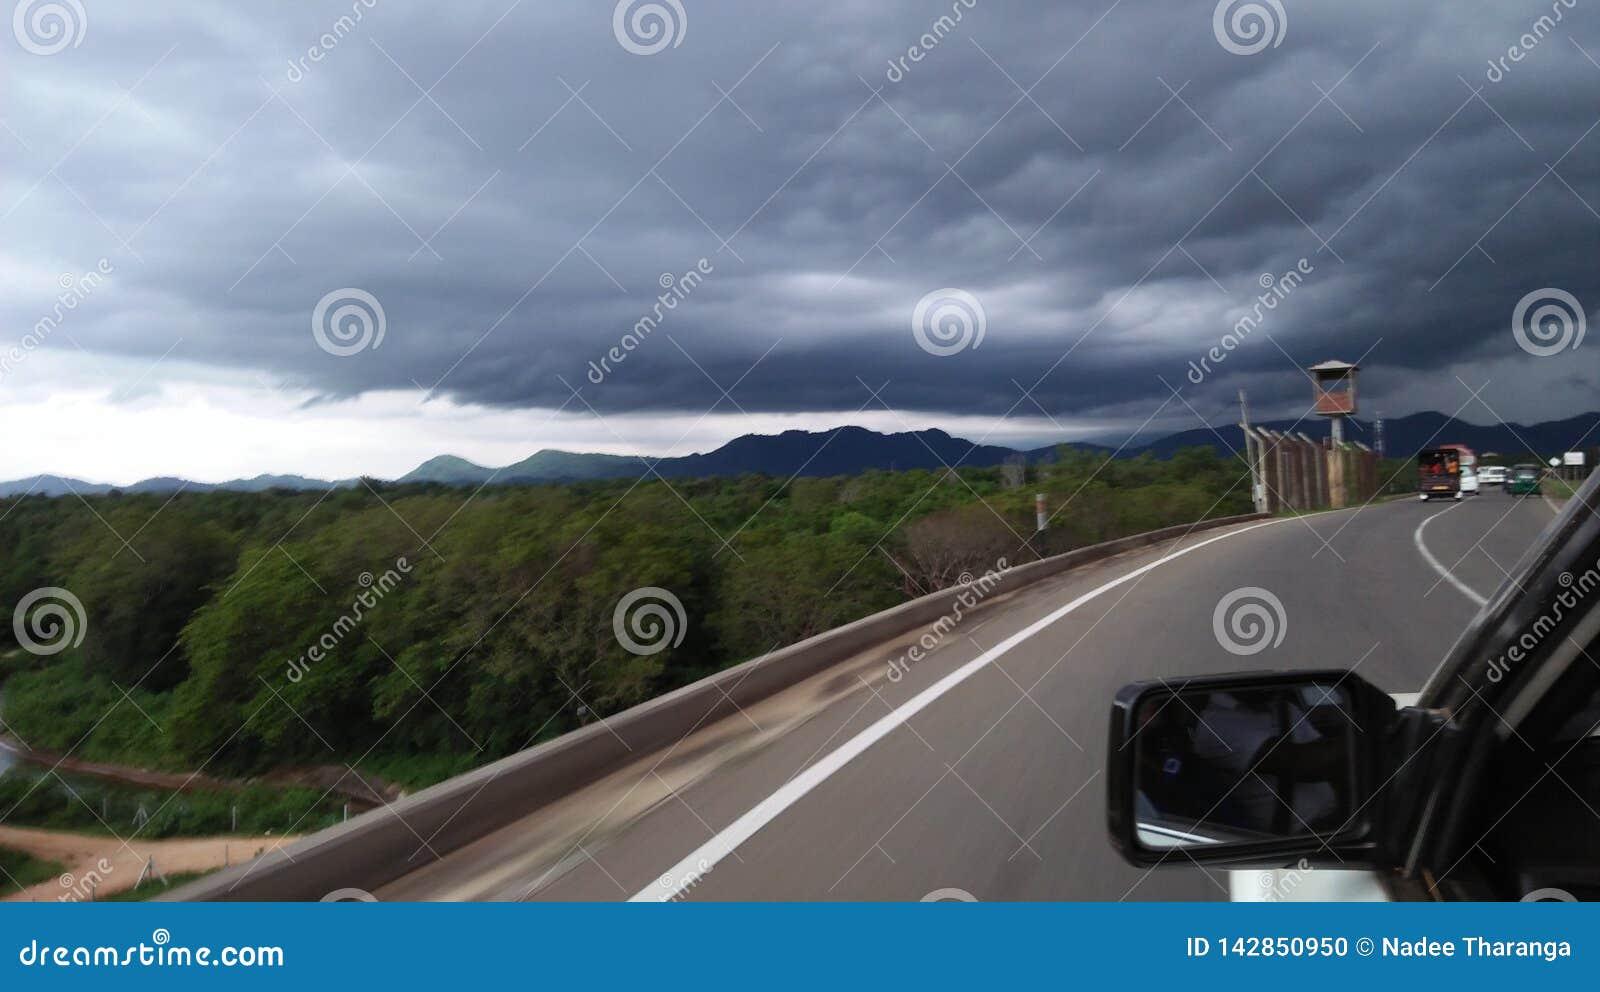 Sri Lanka Highway Road In The Goal Is Beautiful Stock Photo - Image